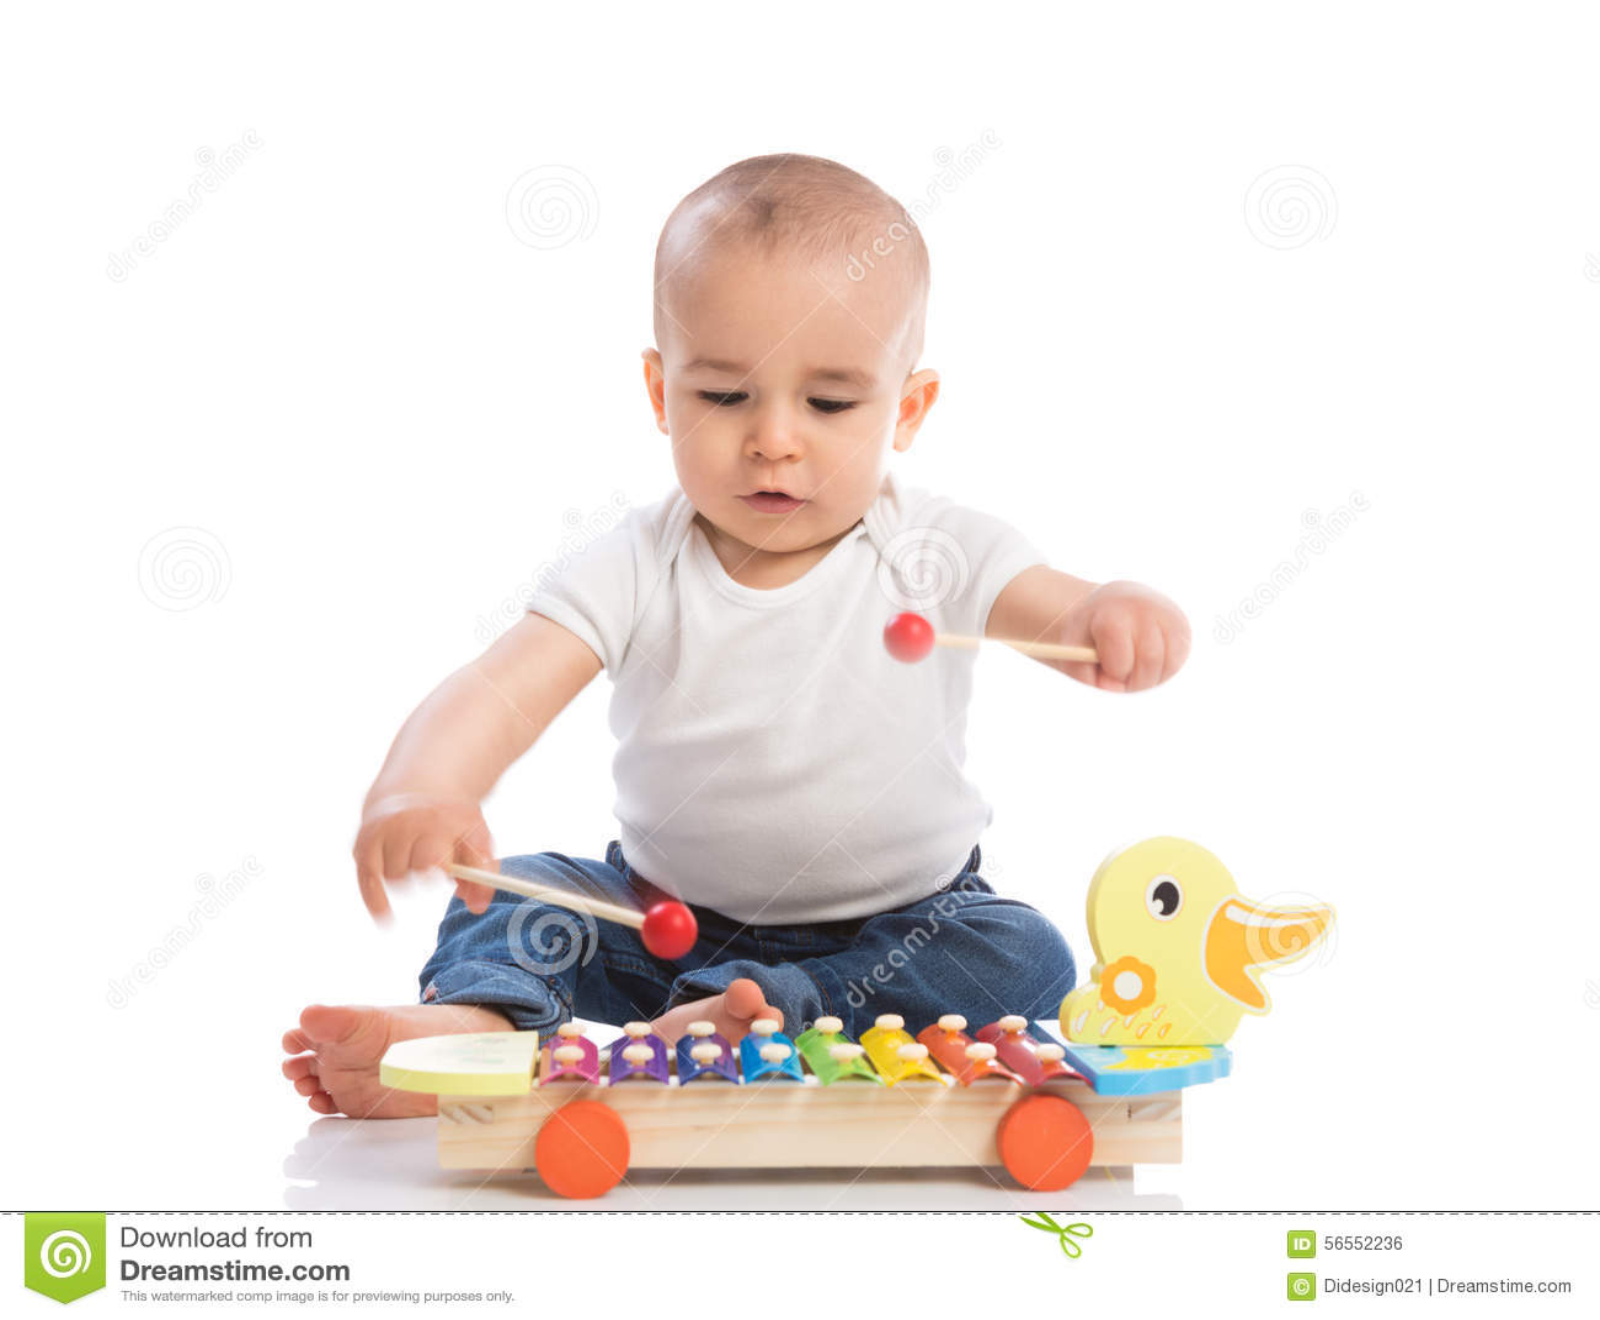 Download Όμορφη συνεδρίαση μωρών και παιχνίδι με το Metallophone Στοκ Εικόνες - εικόνα από φίλων, ανάπτυξη: 56552236